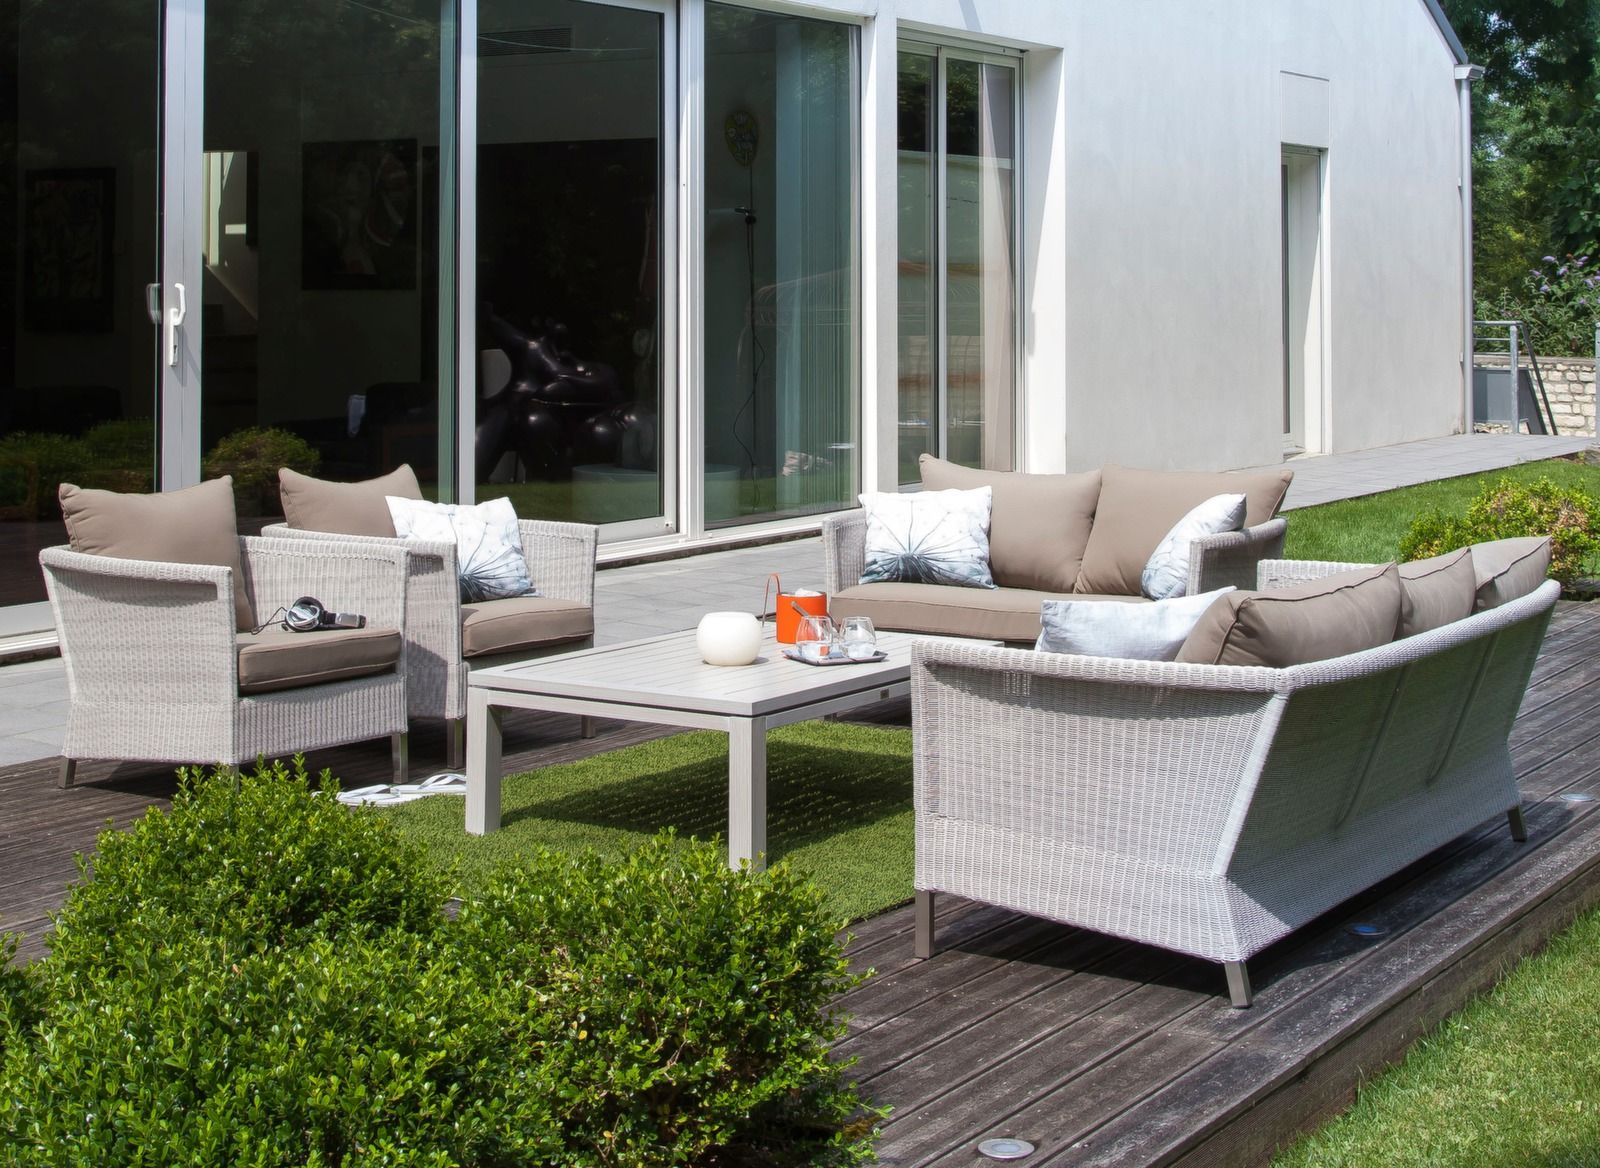 Mobilier De Jardin Oceo | Table De Jardin Denpasar 6 Chaises Gilly